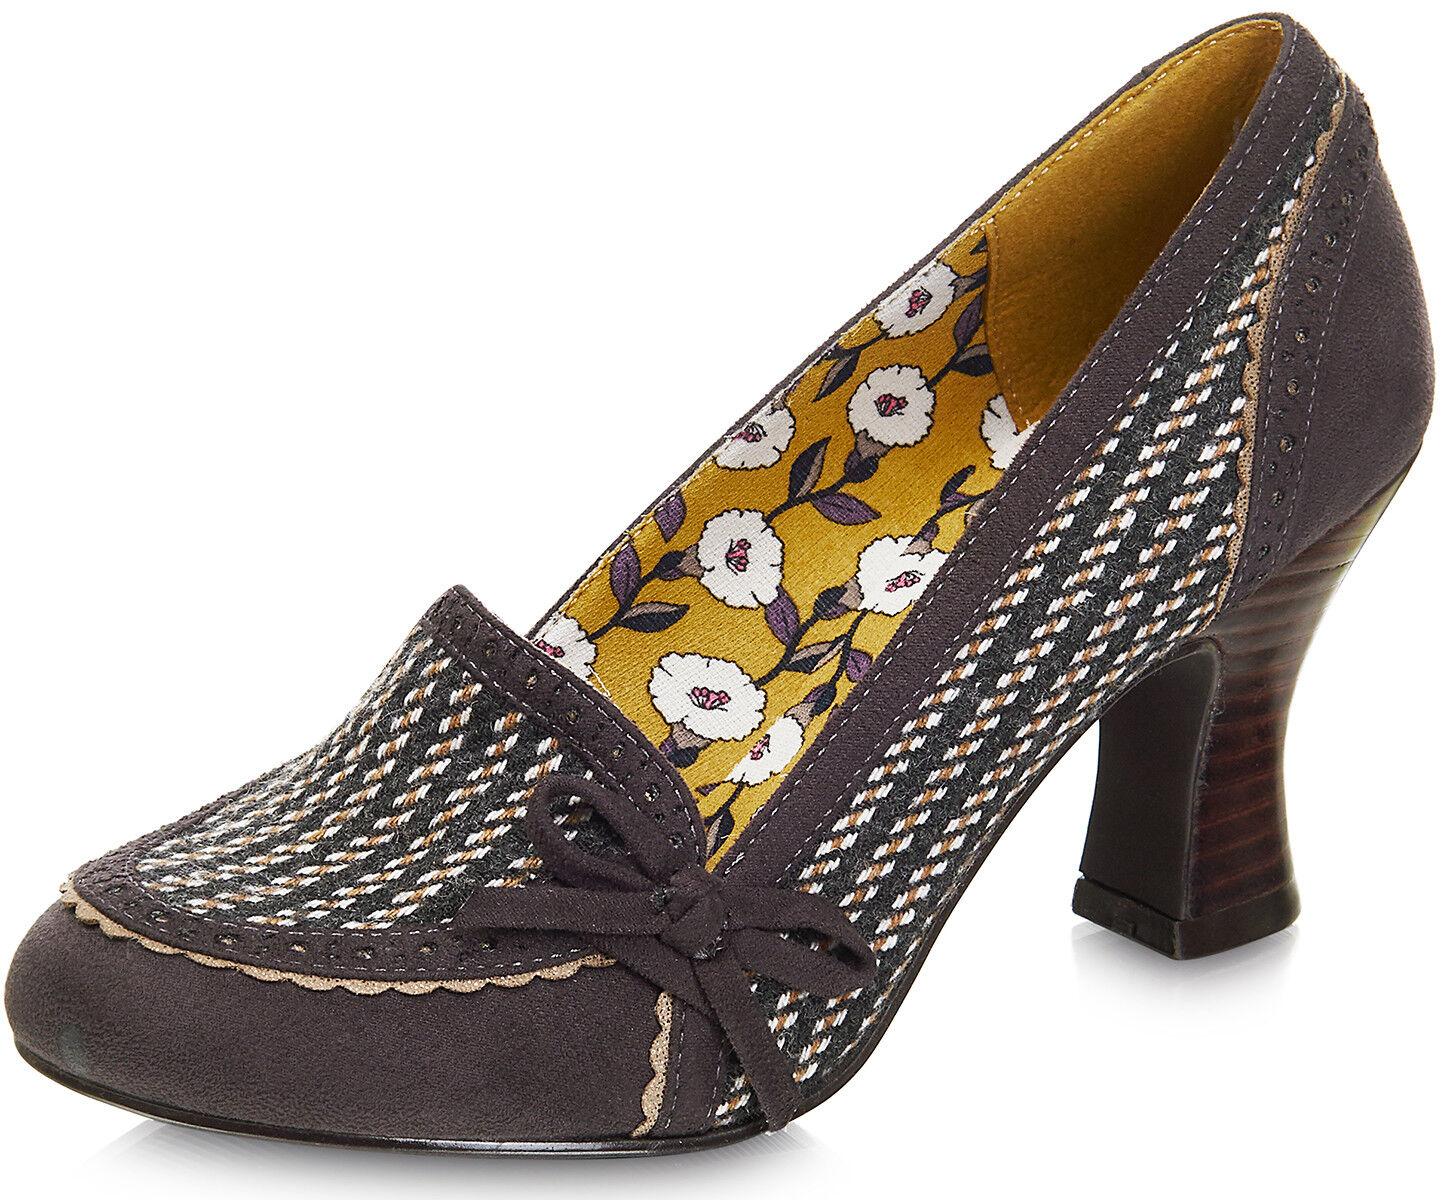 Ruby SHOO Camilla Vintage Floral Pumps Fiori Patent Leather Heels Pumps Floral Rockabilly af4266